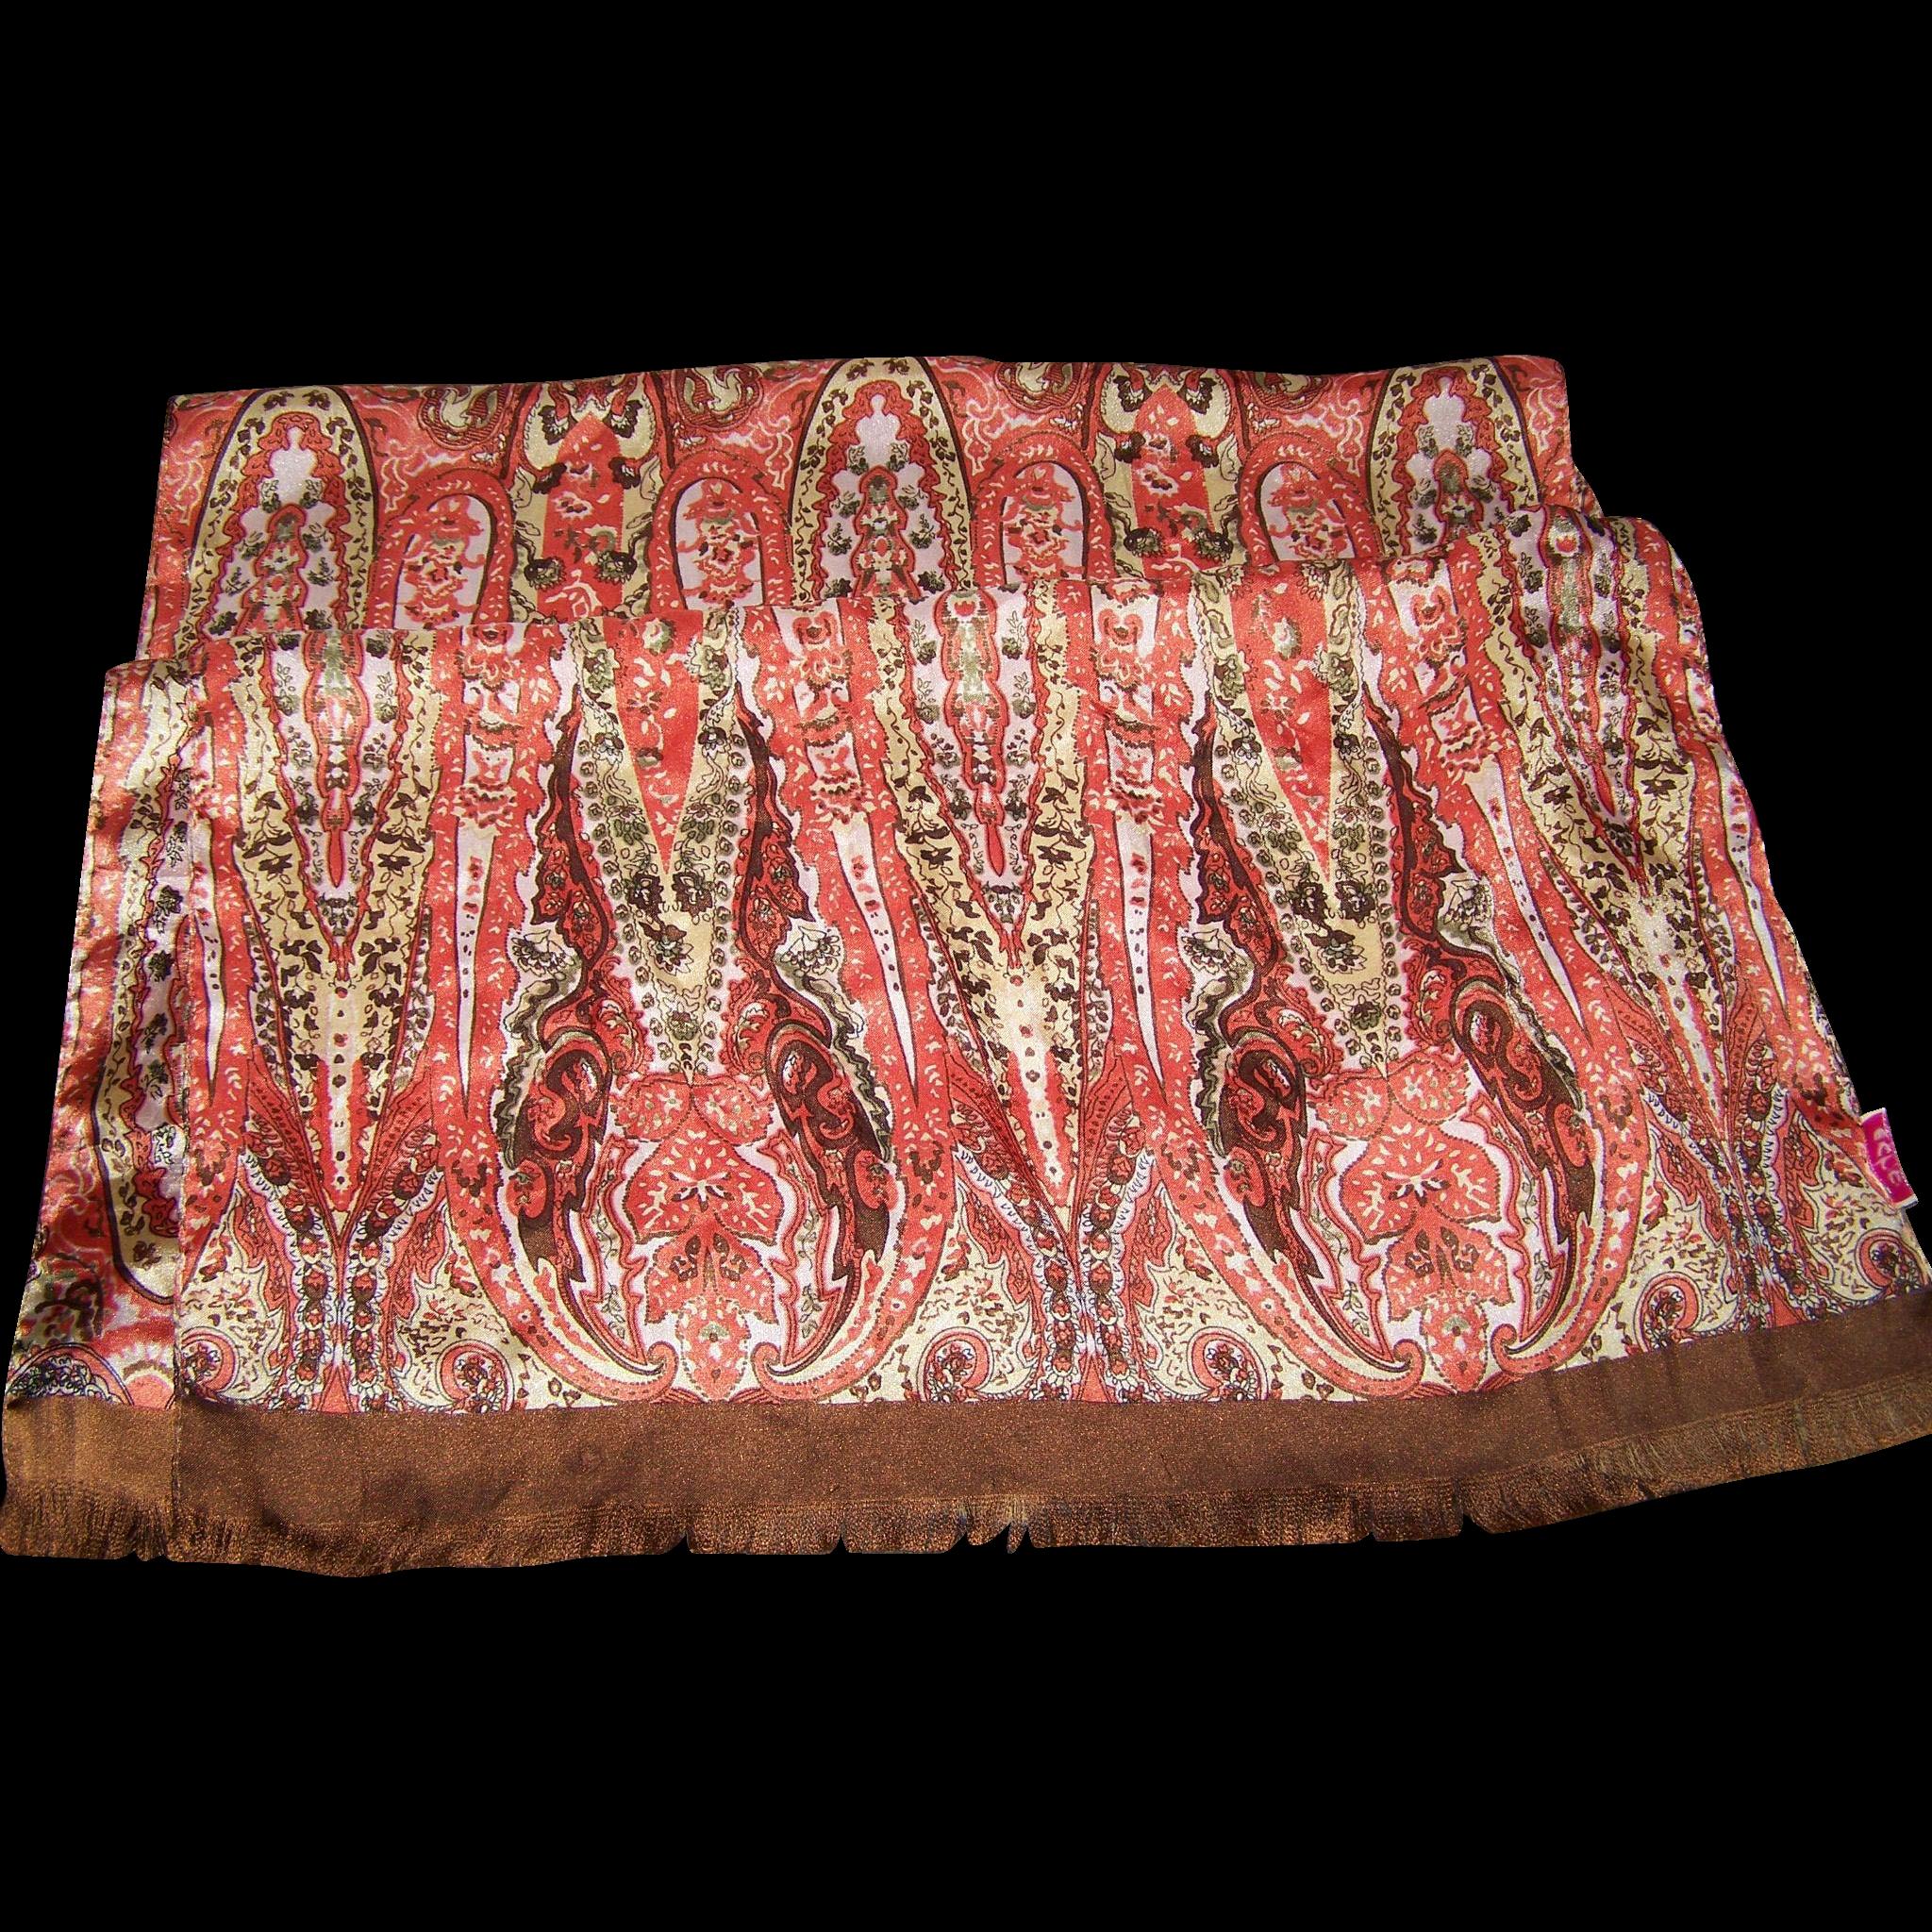 Lovely Long Rectangular Poly Silk Blend Designer ECHO Paisley Print Fringed Scarf